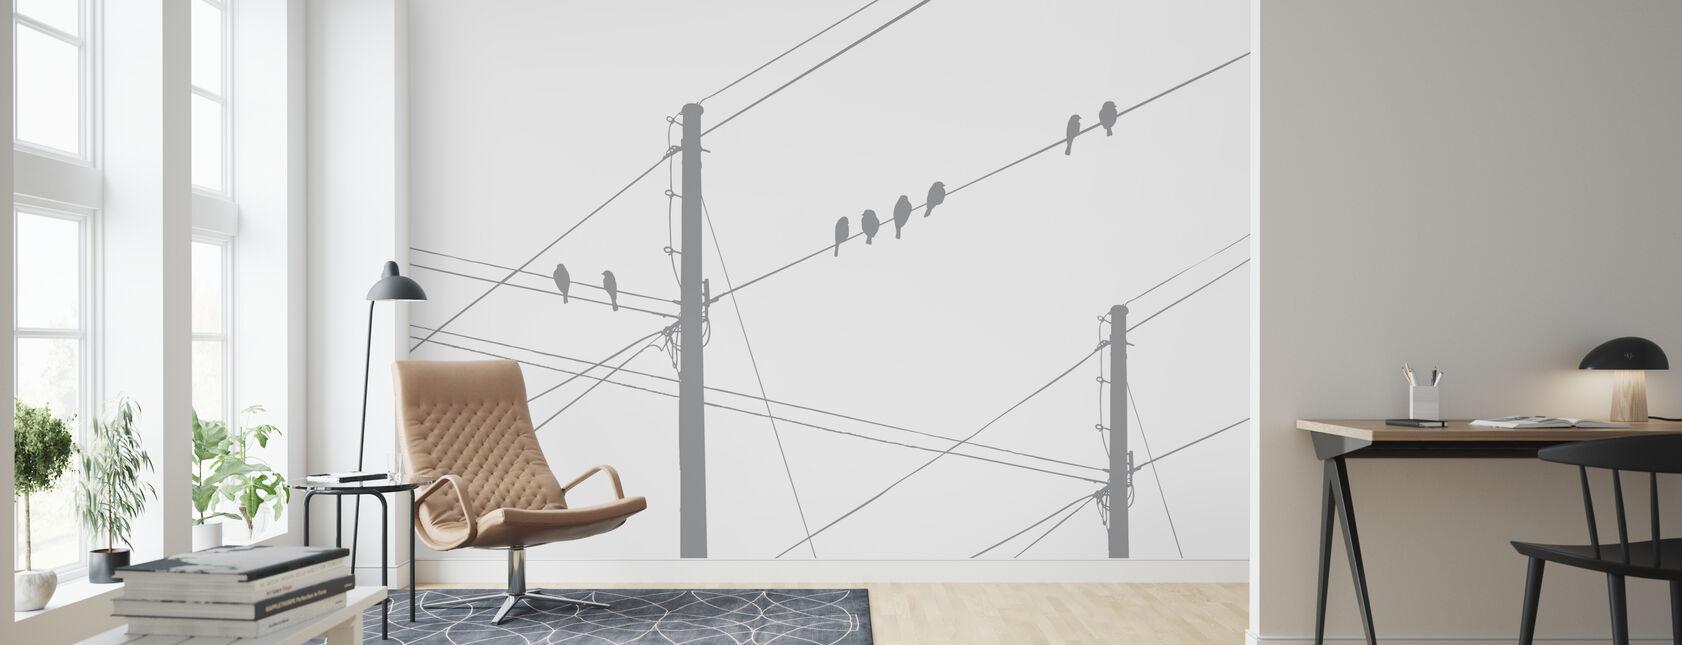 Powerlines - Grey - Wallpaper - Living Room